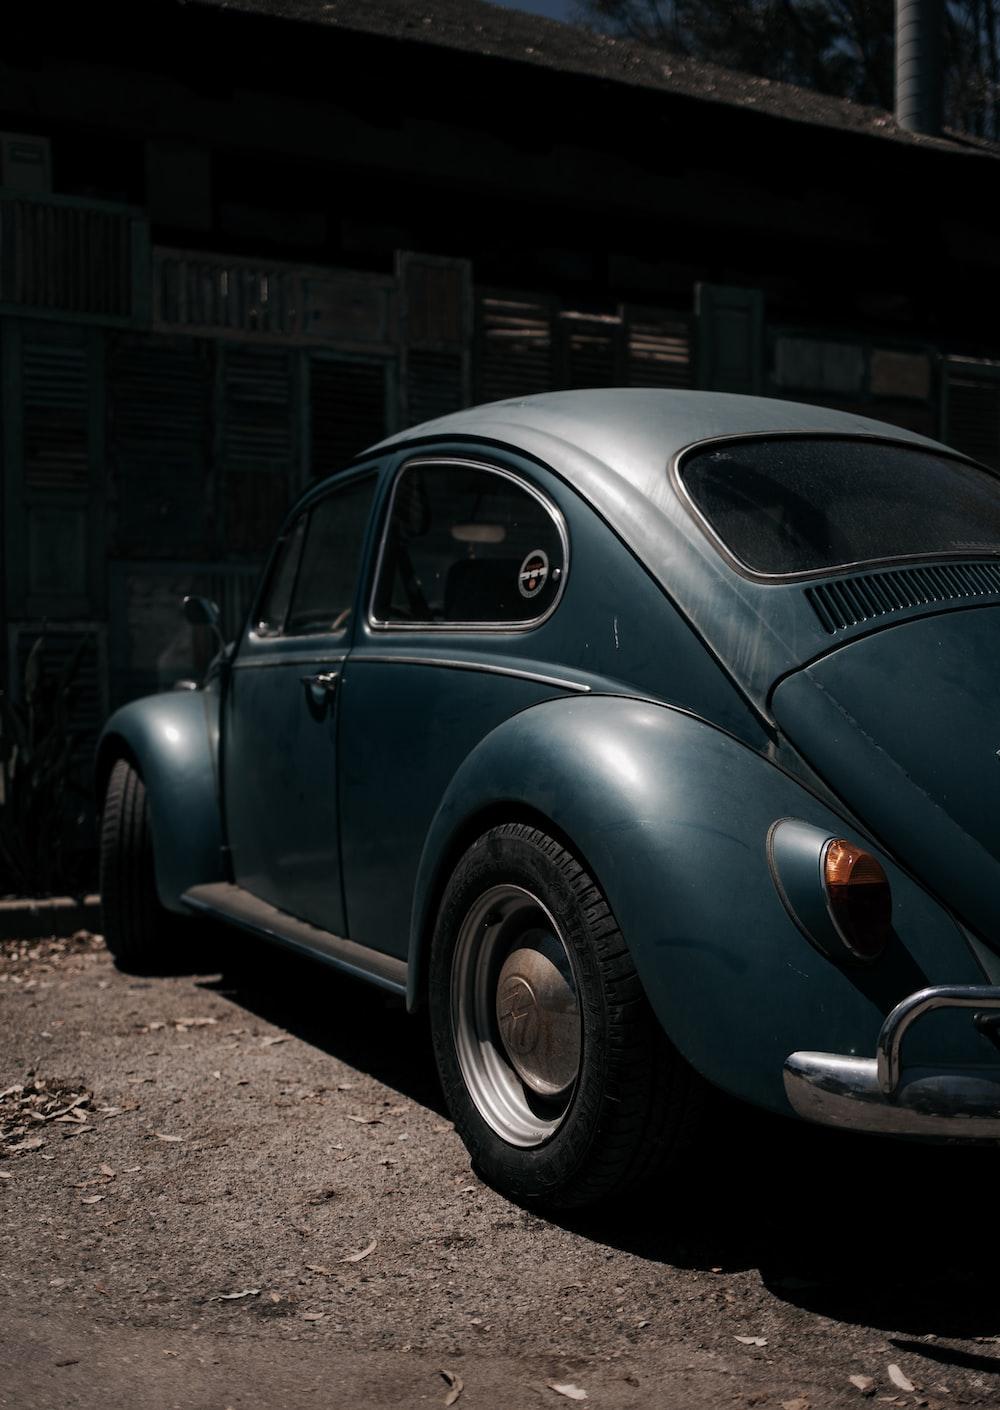 blue volkswagen beetle parked near building